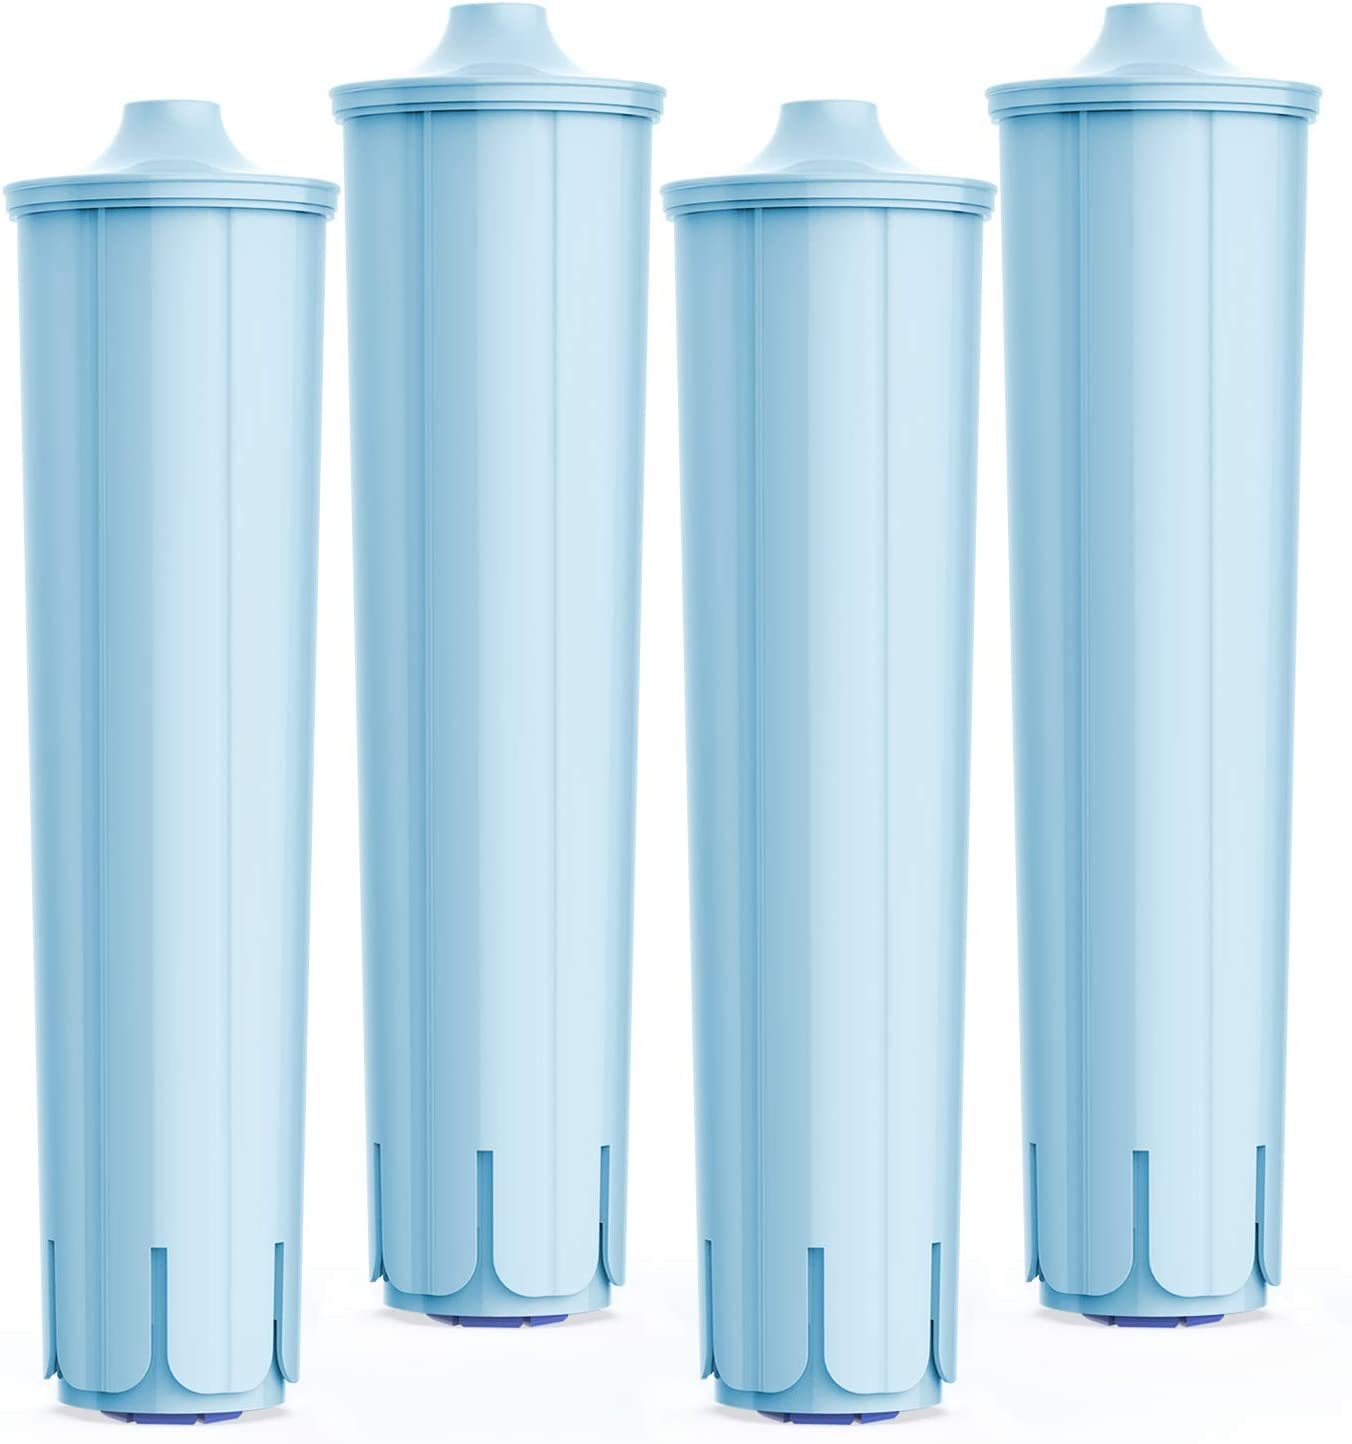 Wasserfilter f/ür Jura Kaffeemaschine Wasserfilterpatrone Jura Claris Blue 2er Pack